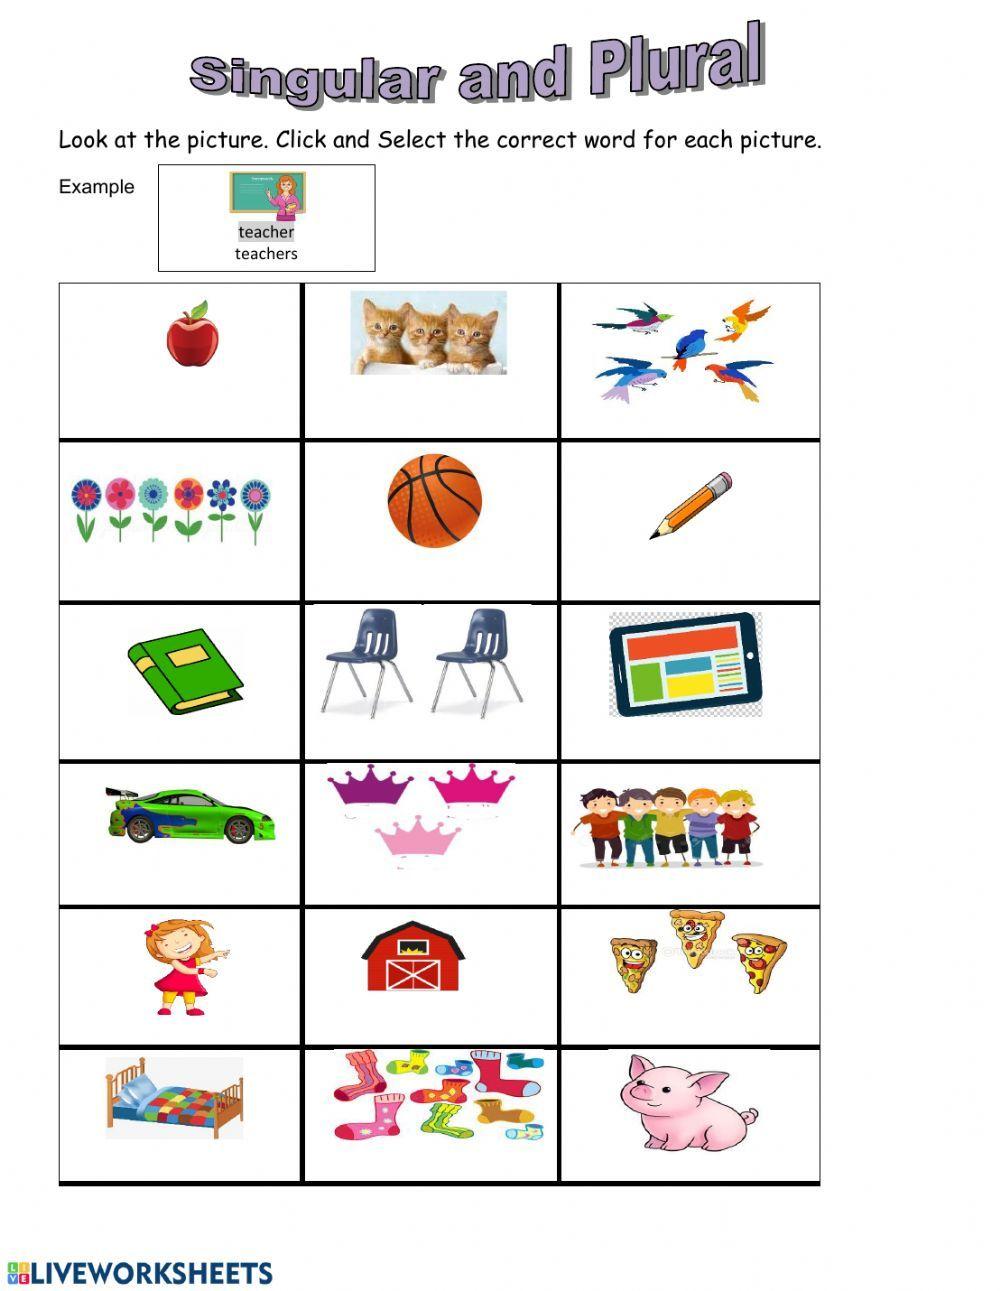 Singular And Plural Noun First Grade Interactive Worksheet Singular And Plural Nouns Nouns First Grade Singular And Plural Singular and plural nouns worksheets